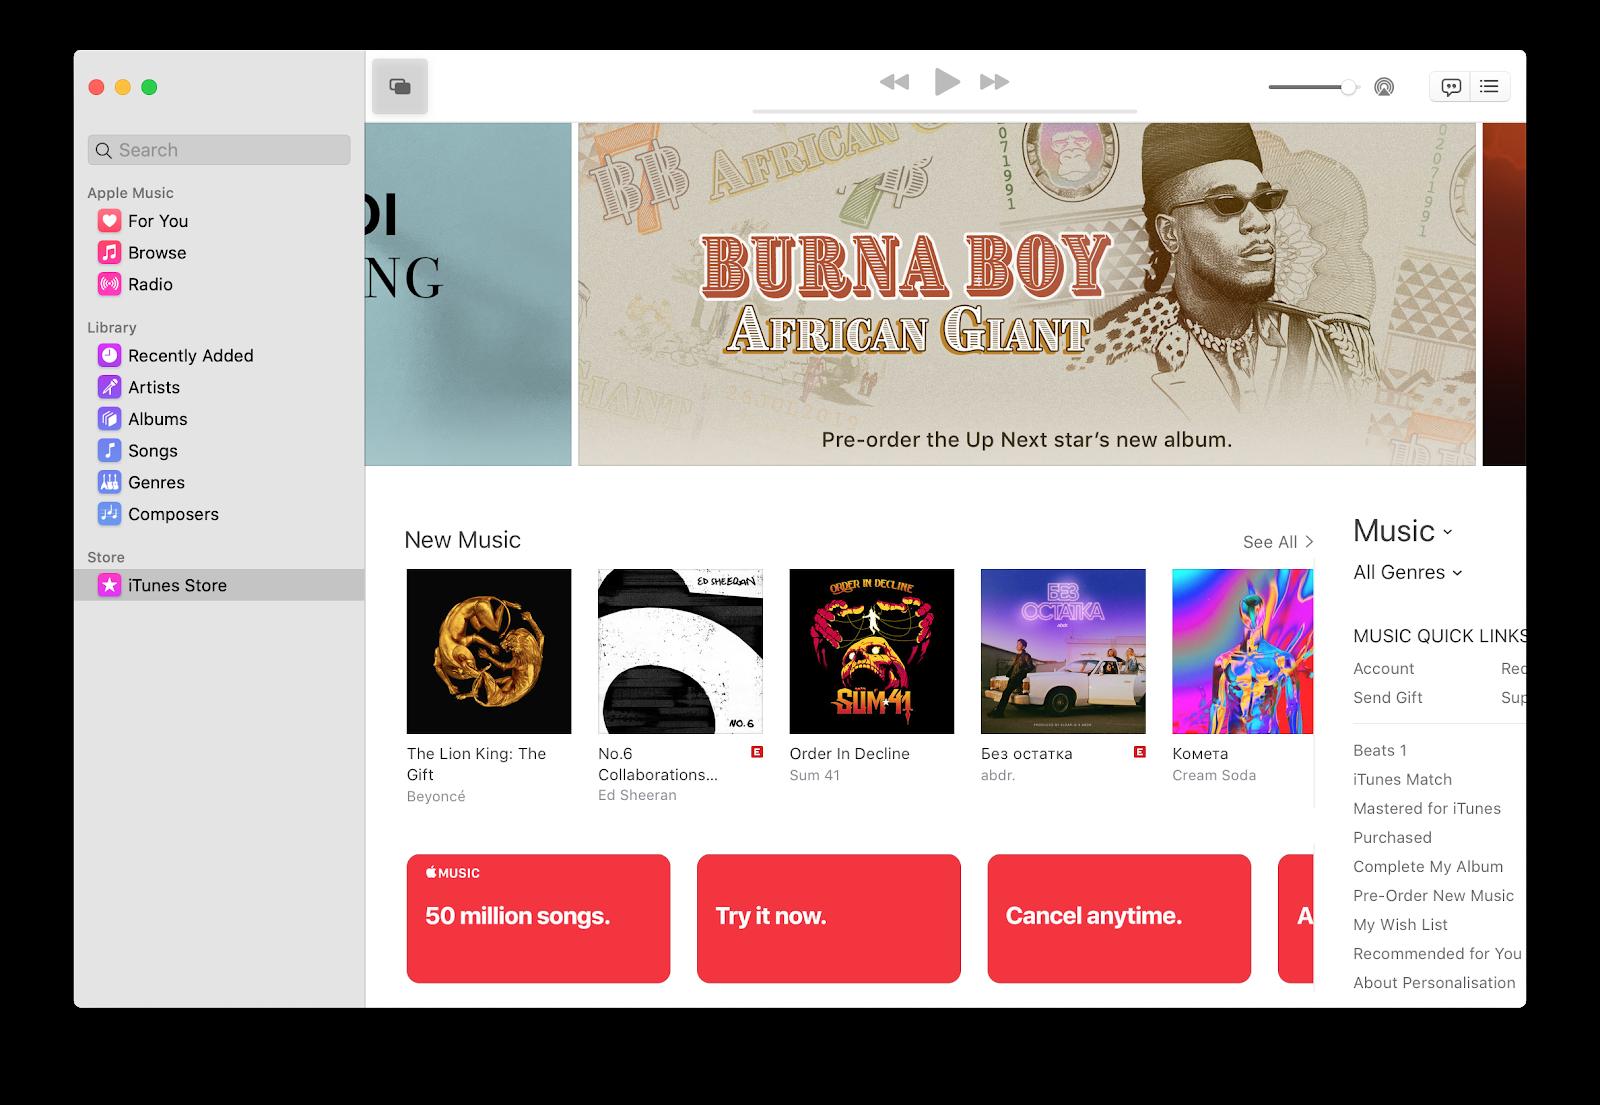 iTunes Store improvement